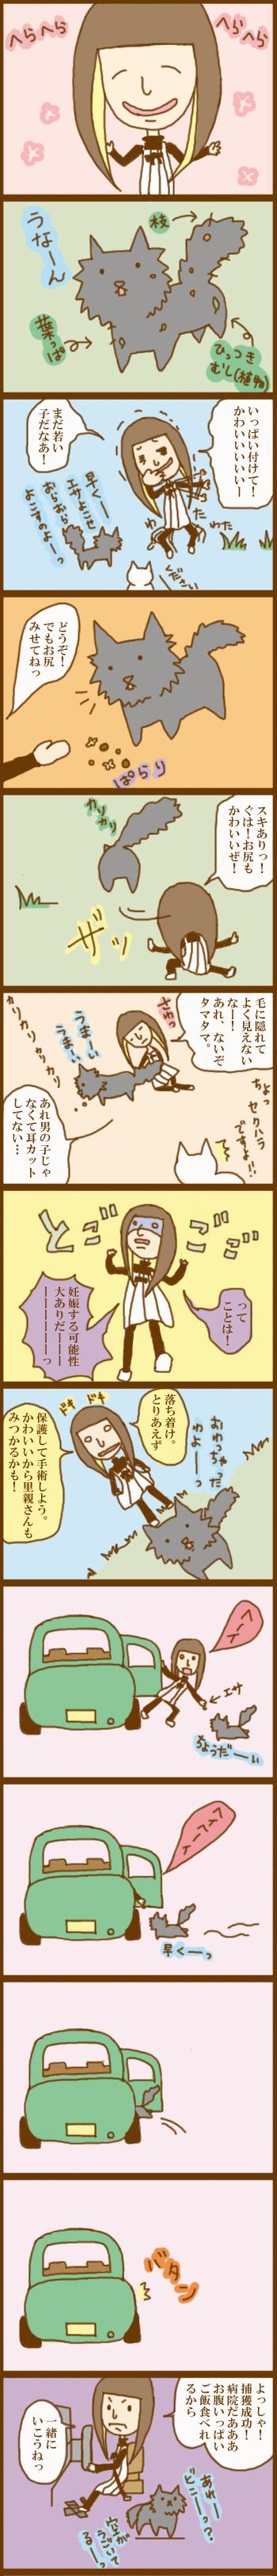 f:id:suzuokayu:20201017225005j:plain